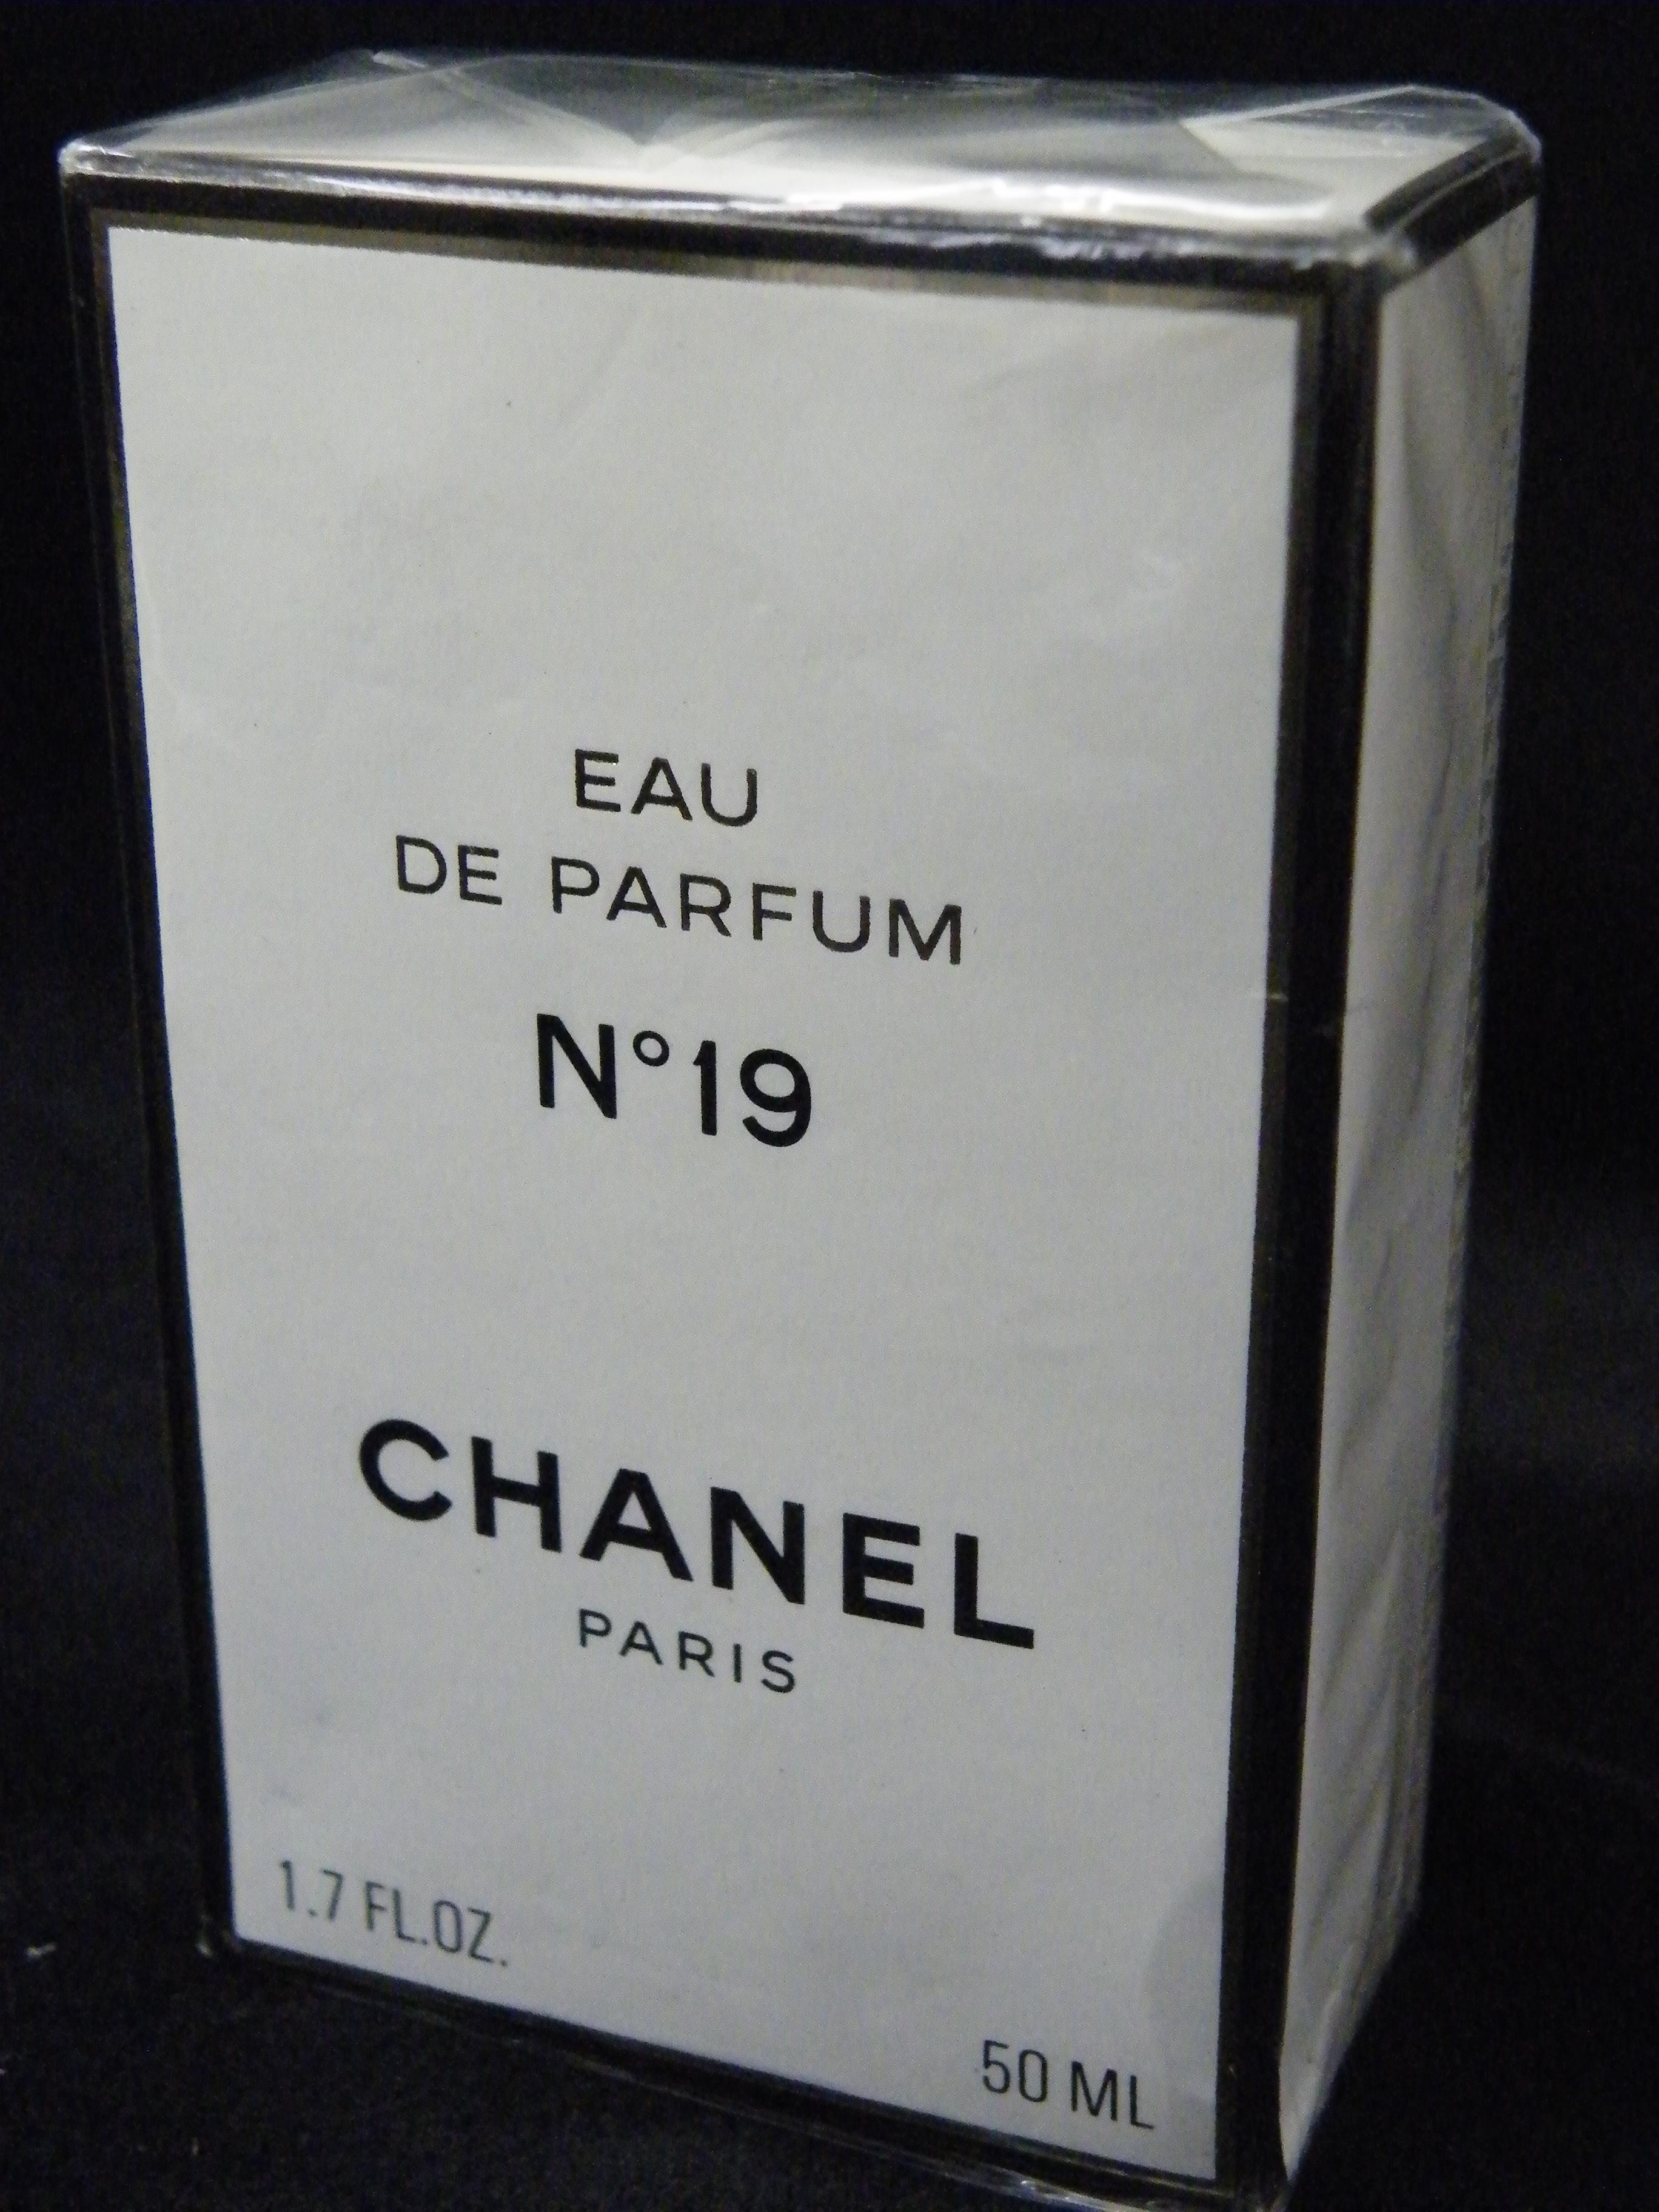 HANELシャネル No19 オードパルファム